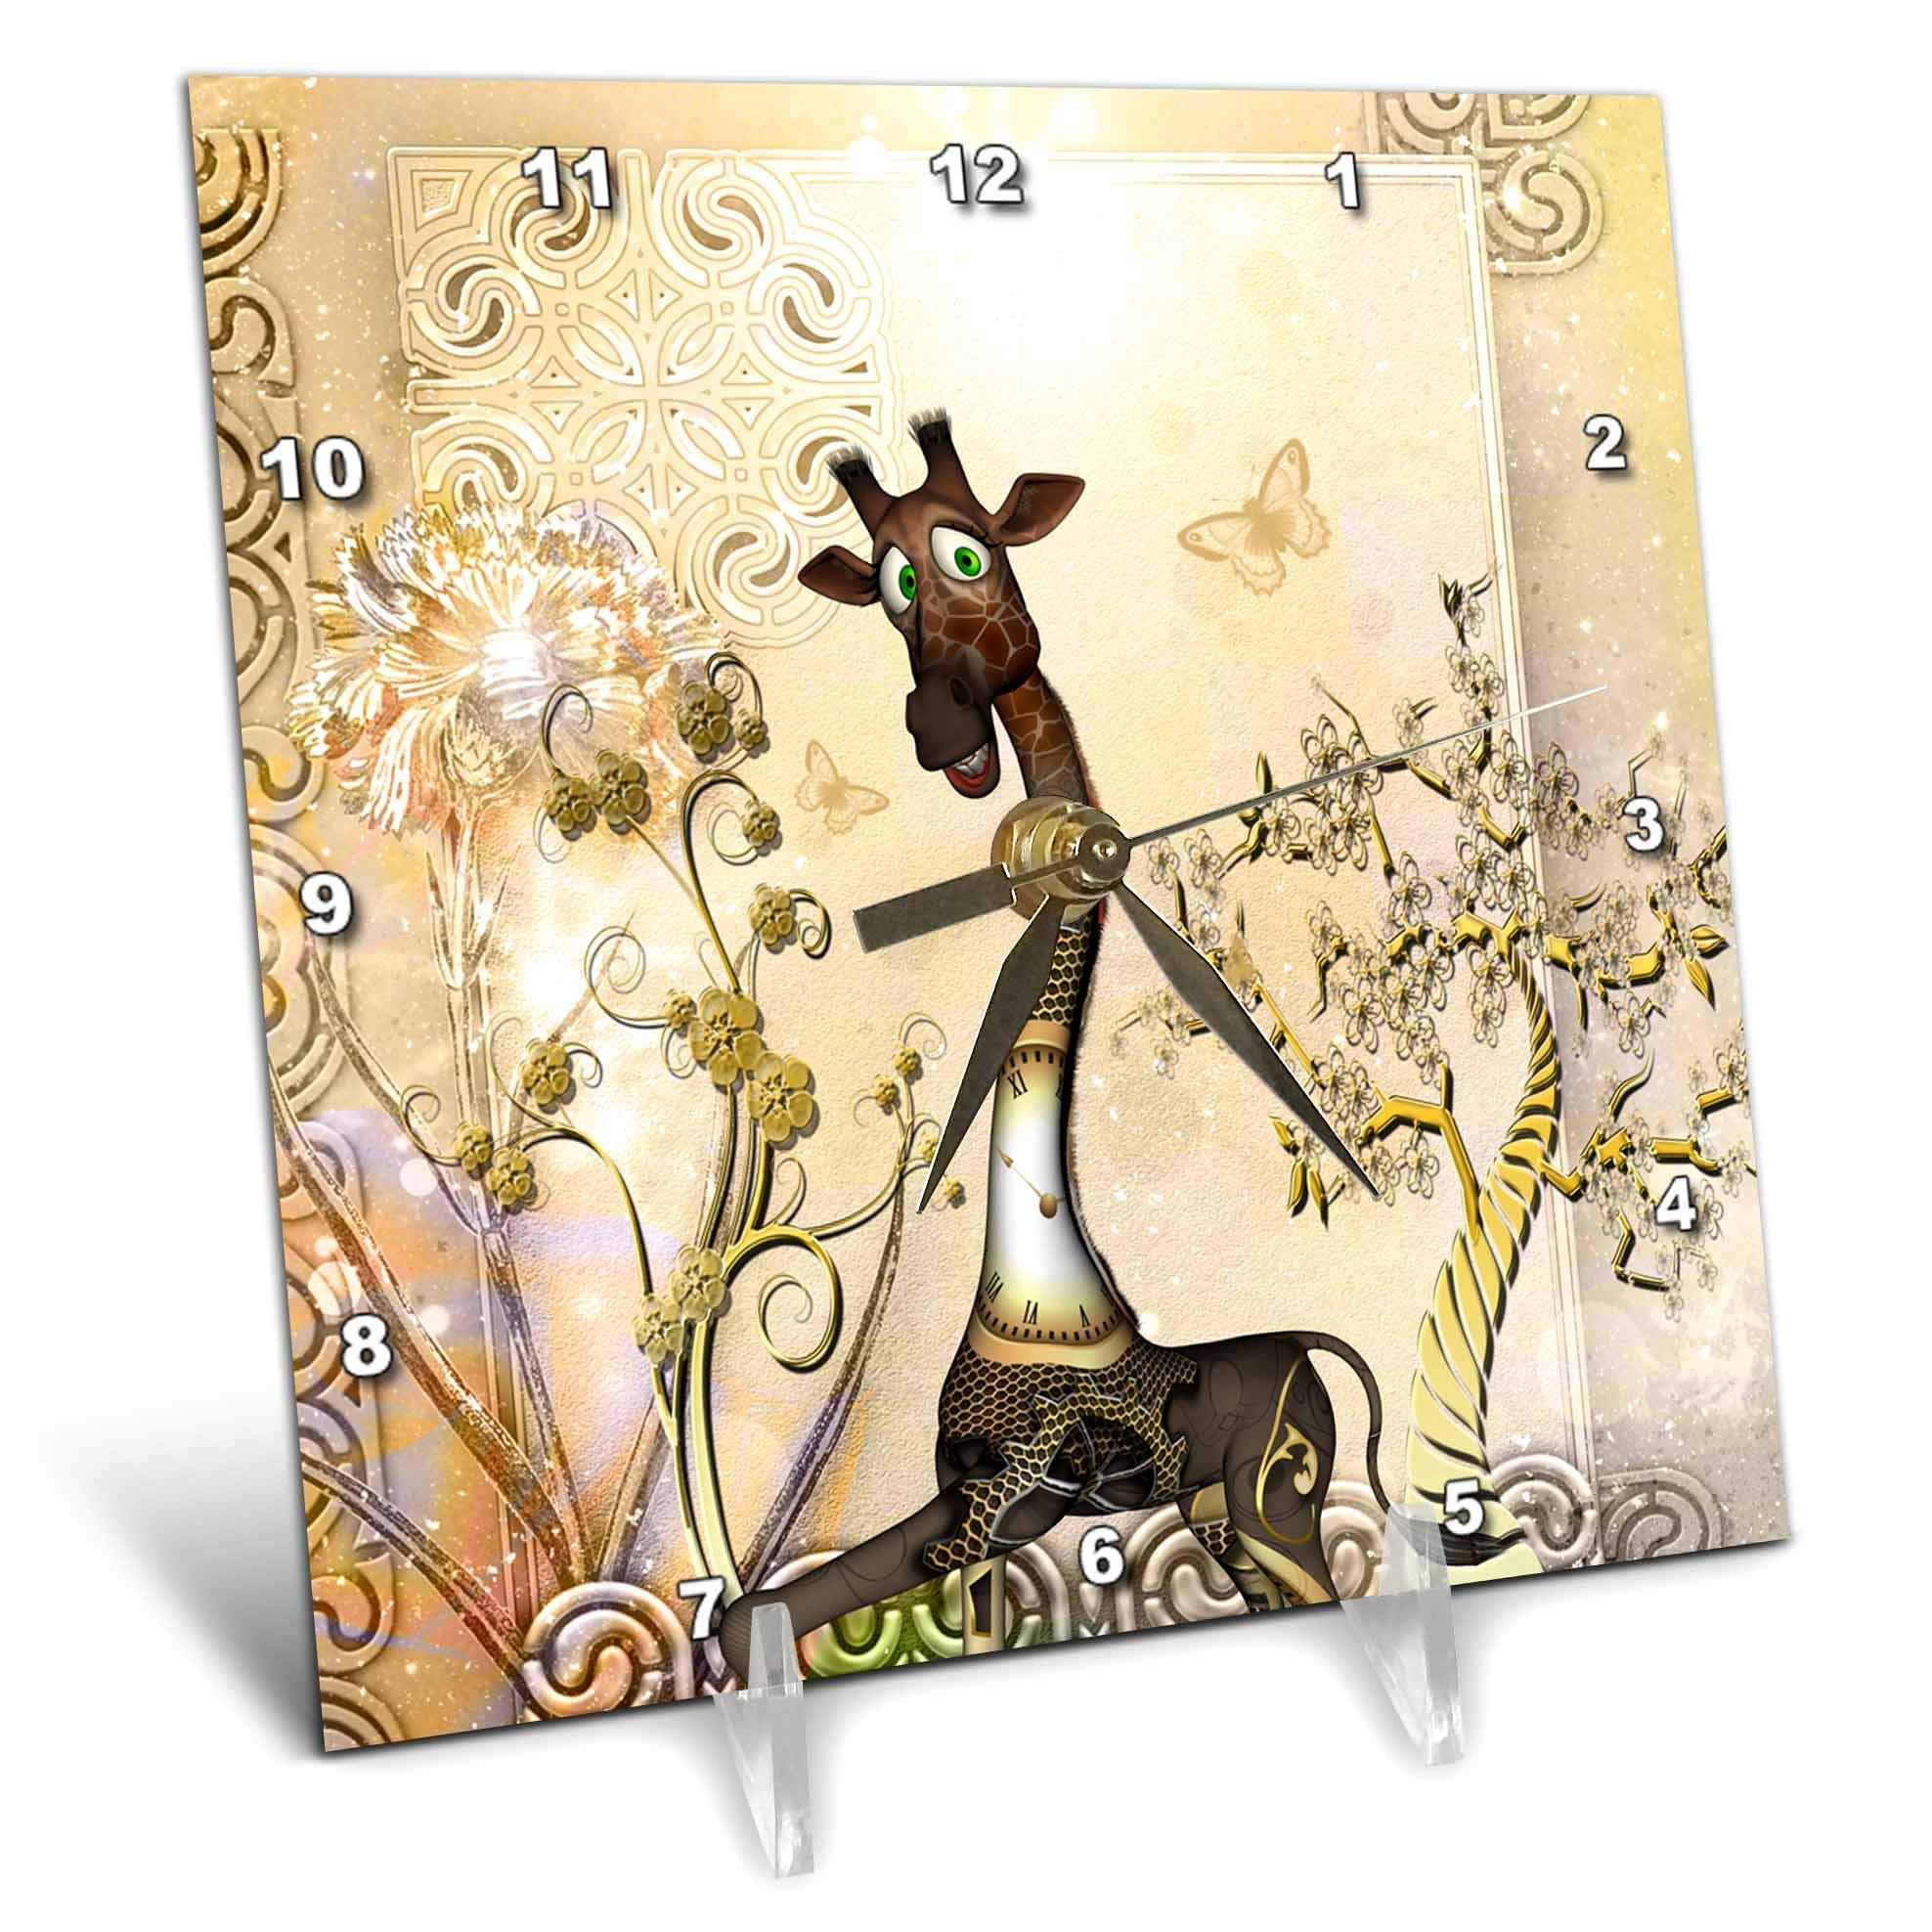 3dRose Heike Köhnen Design Steampunk - Funny steampunk giraffe with clocks and gears - 6x6 Desk Clock (dc_289162_1)